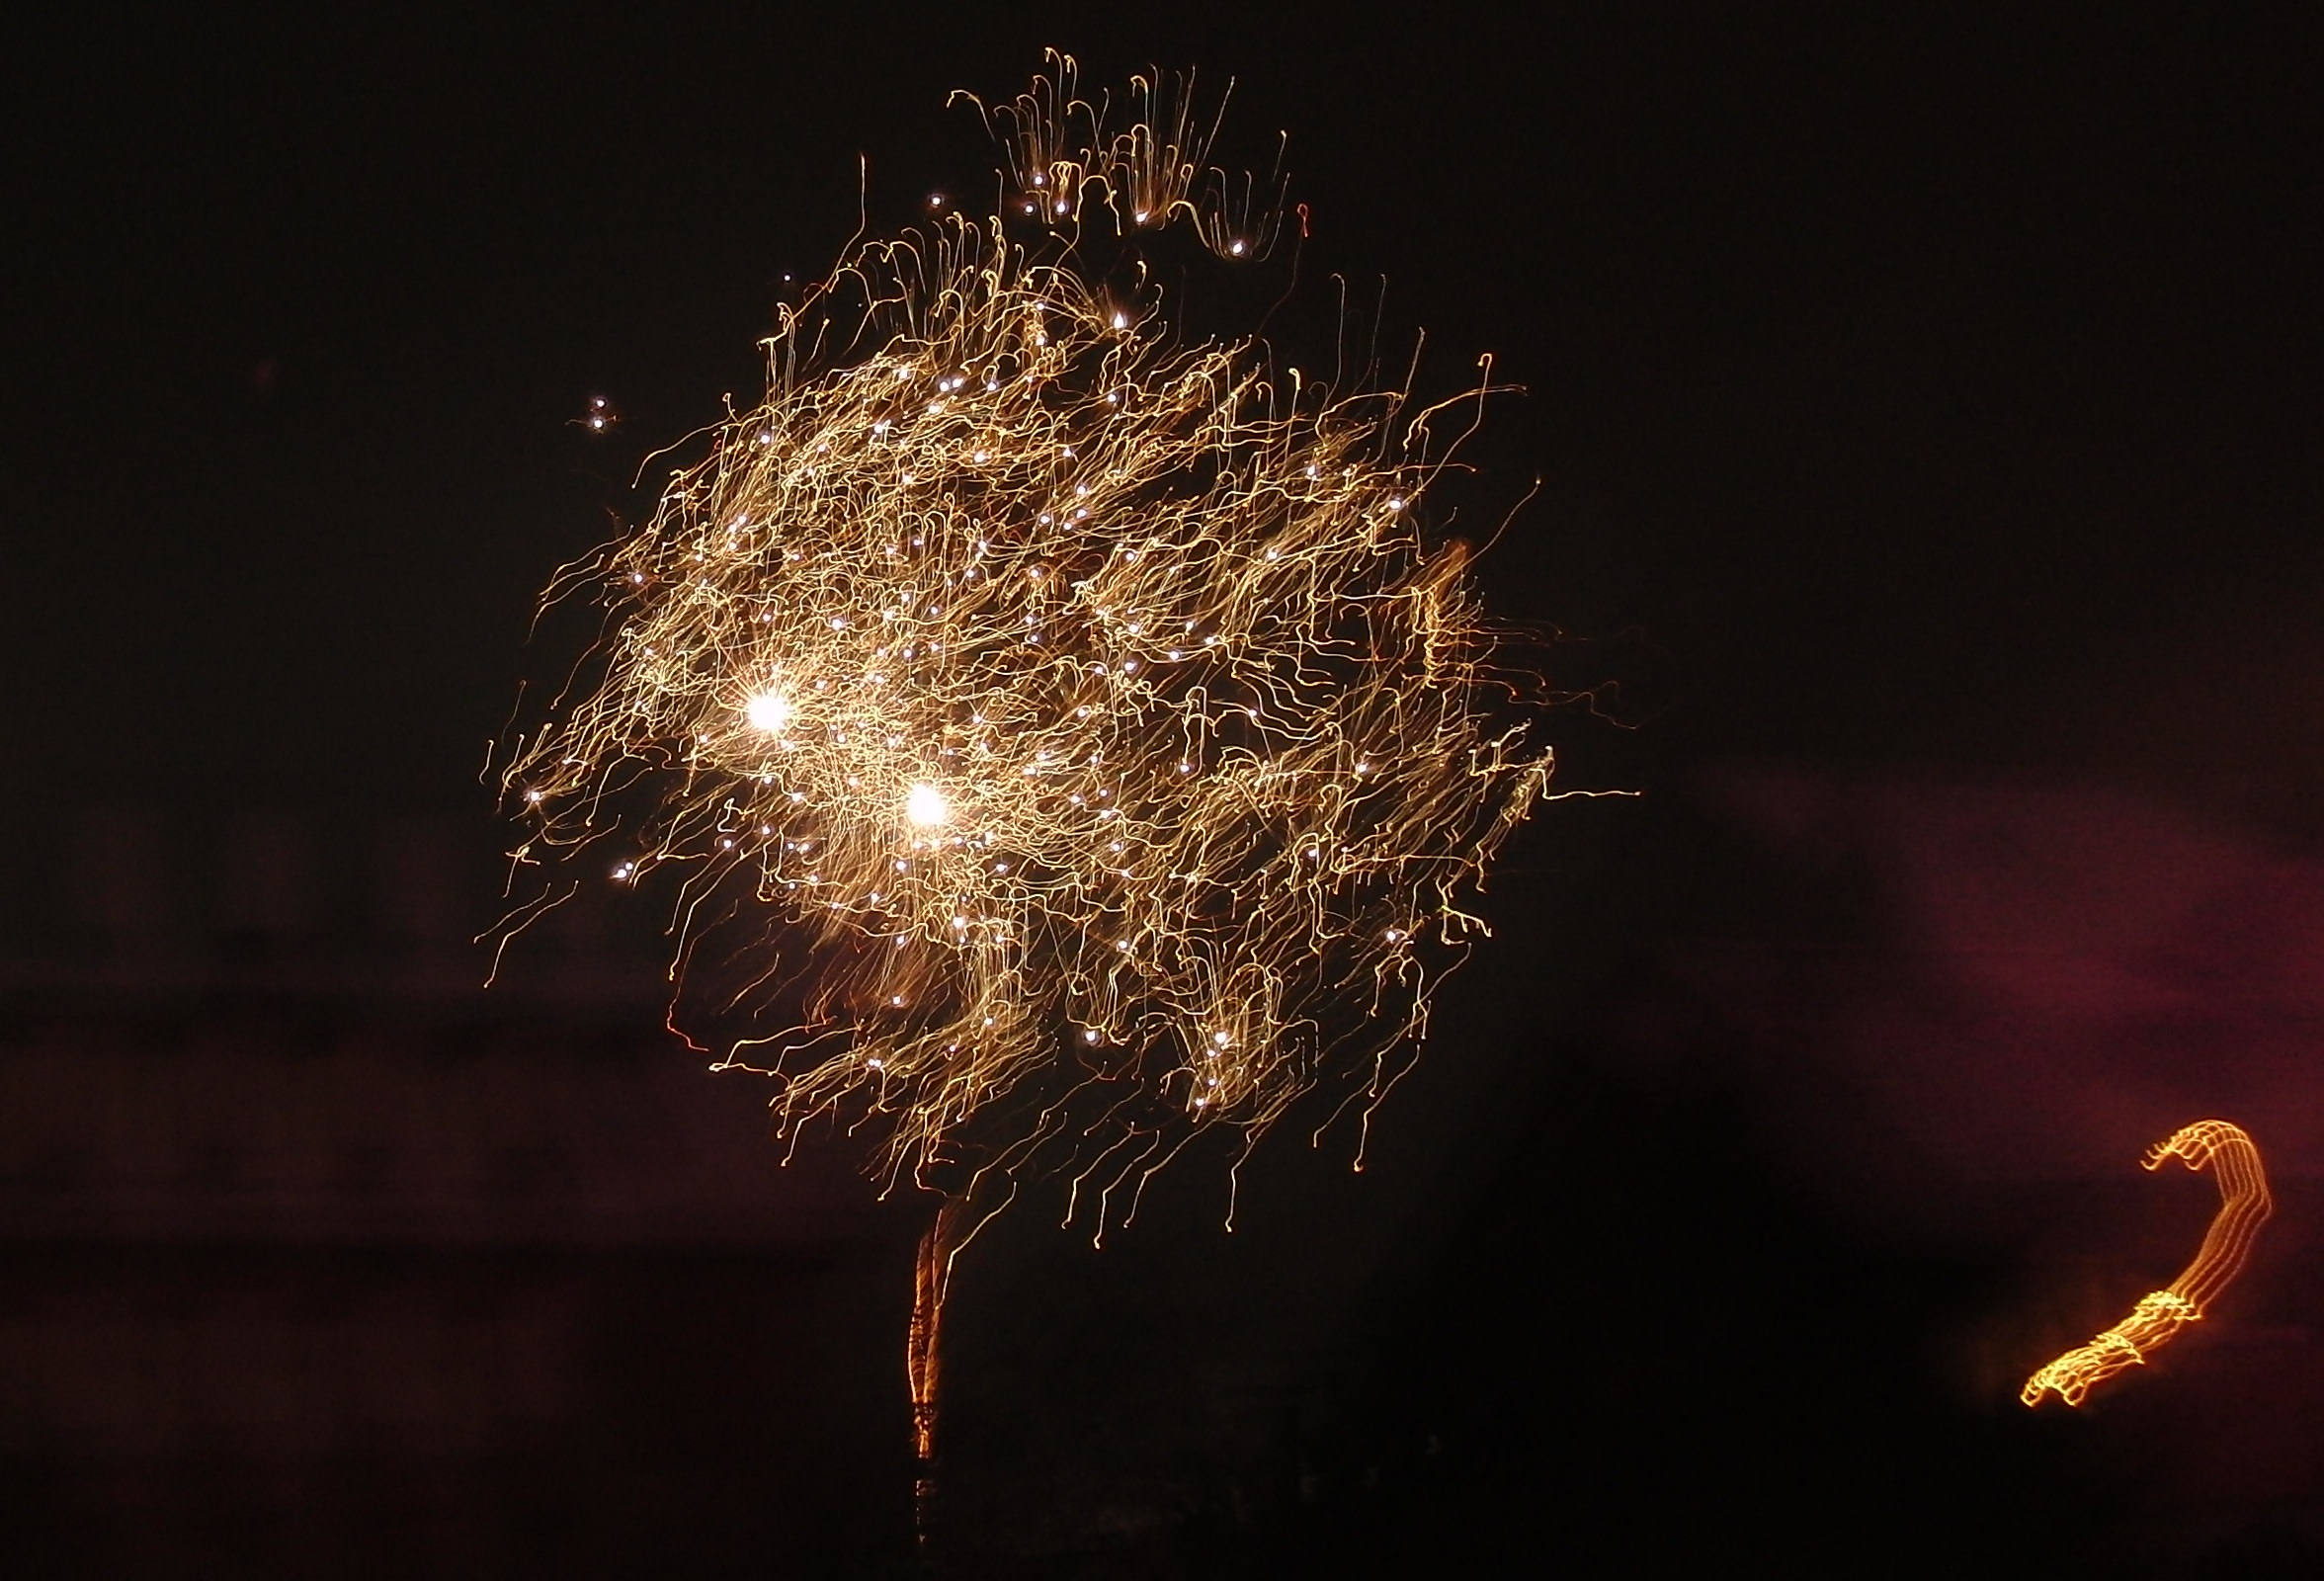 Frohes Neues Jahr 2010 - Seo.de